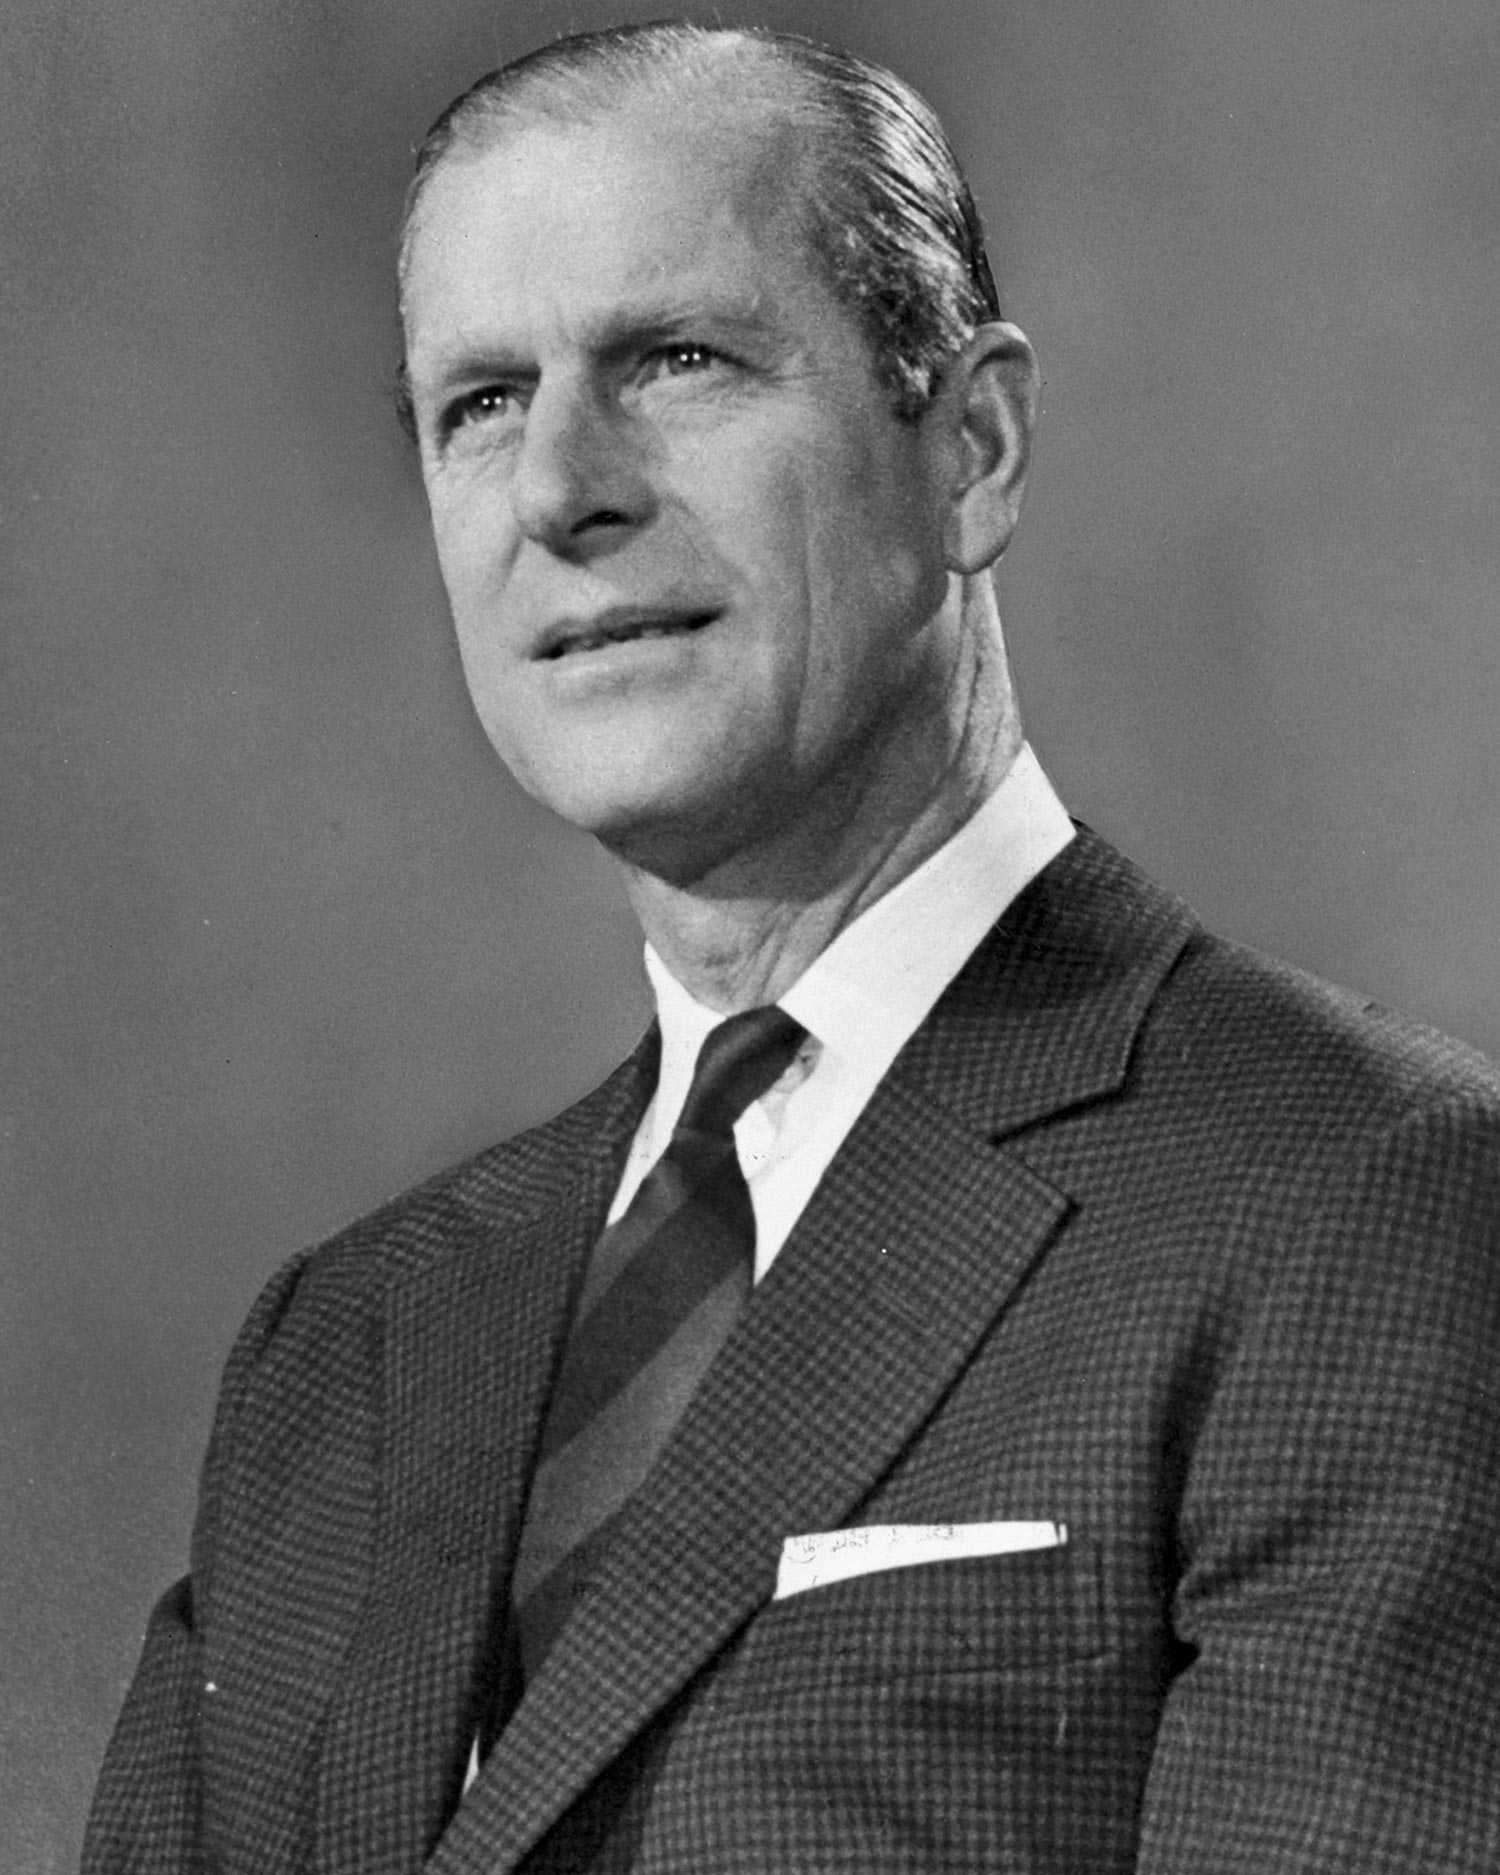 Prince Philip 1973Prince Philip 1973 (Photo by Prince Philip 1973